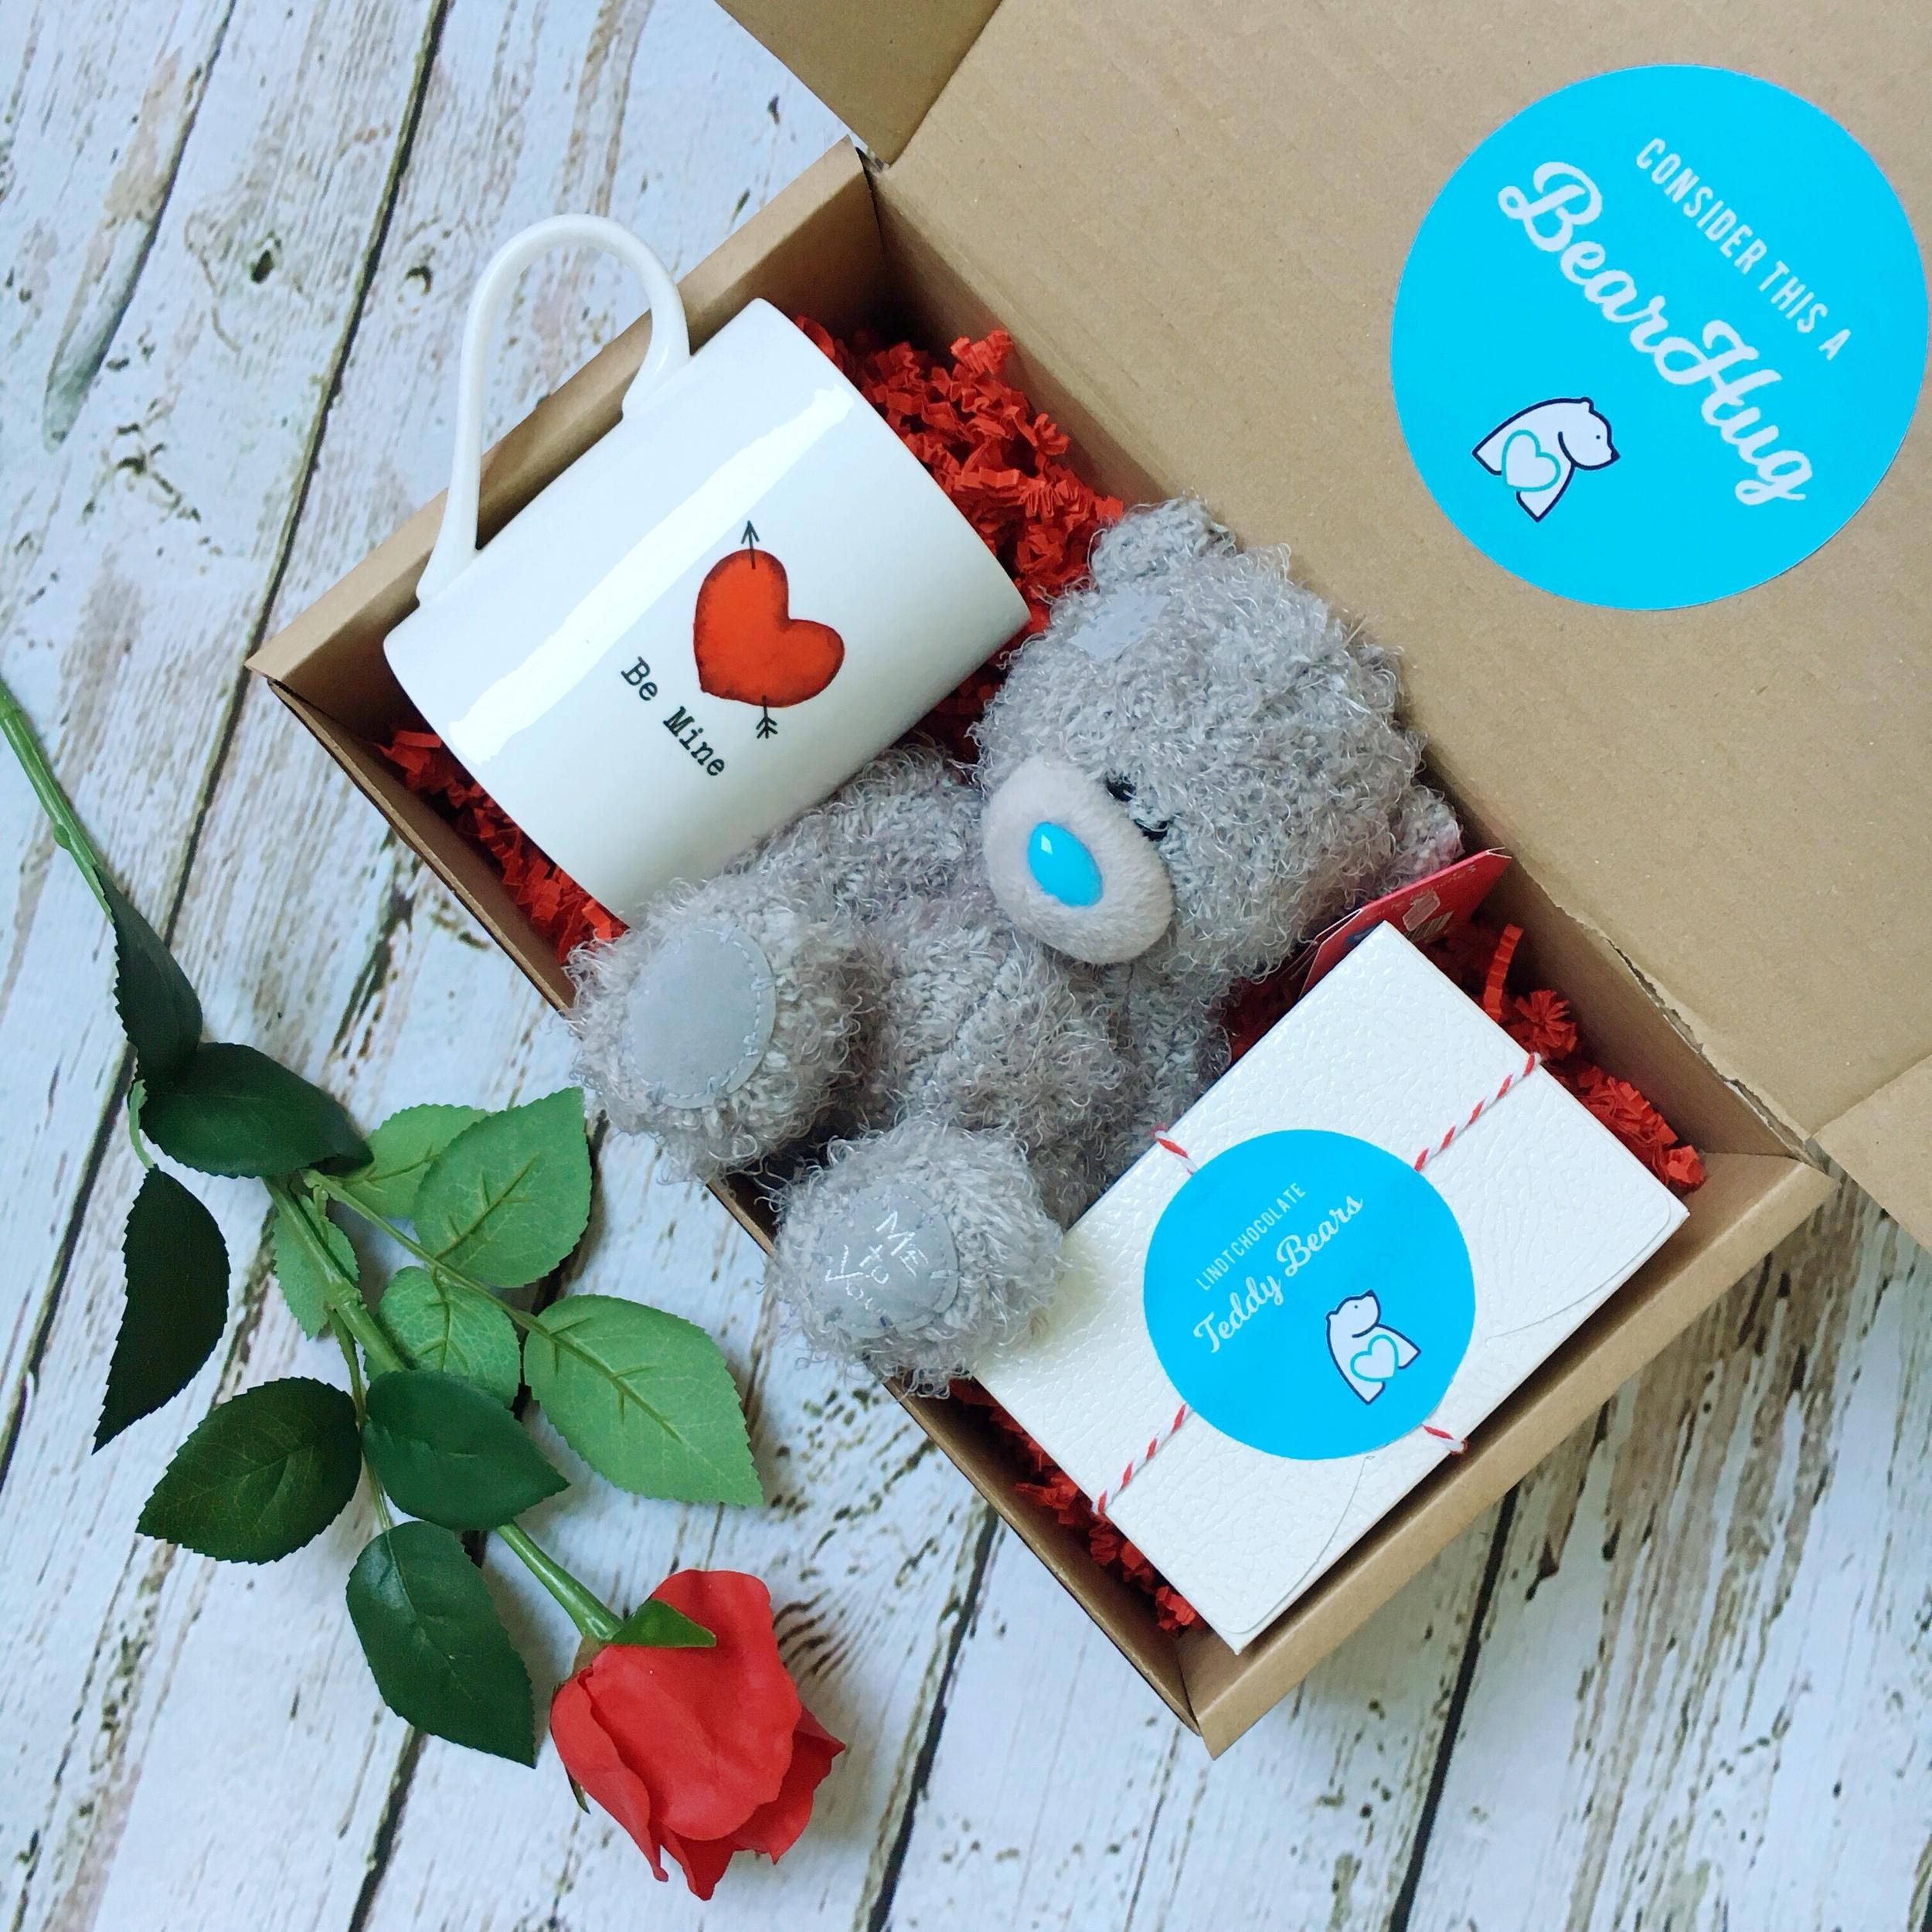 Valentine's Day gift box bearhugs gifts